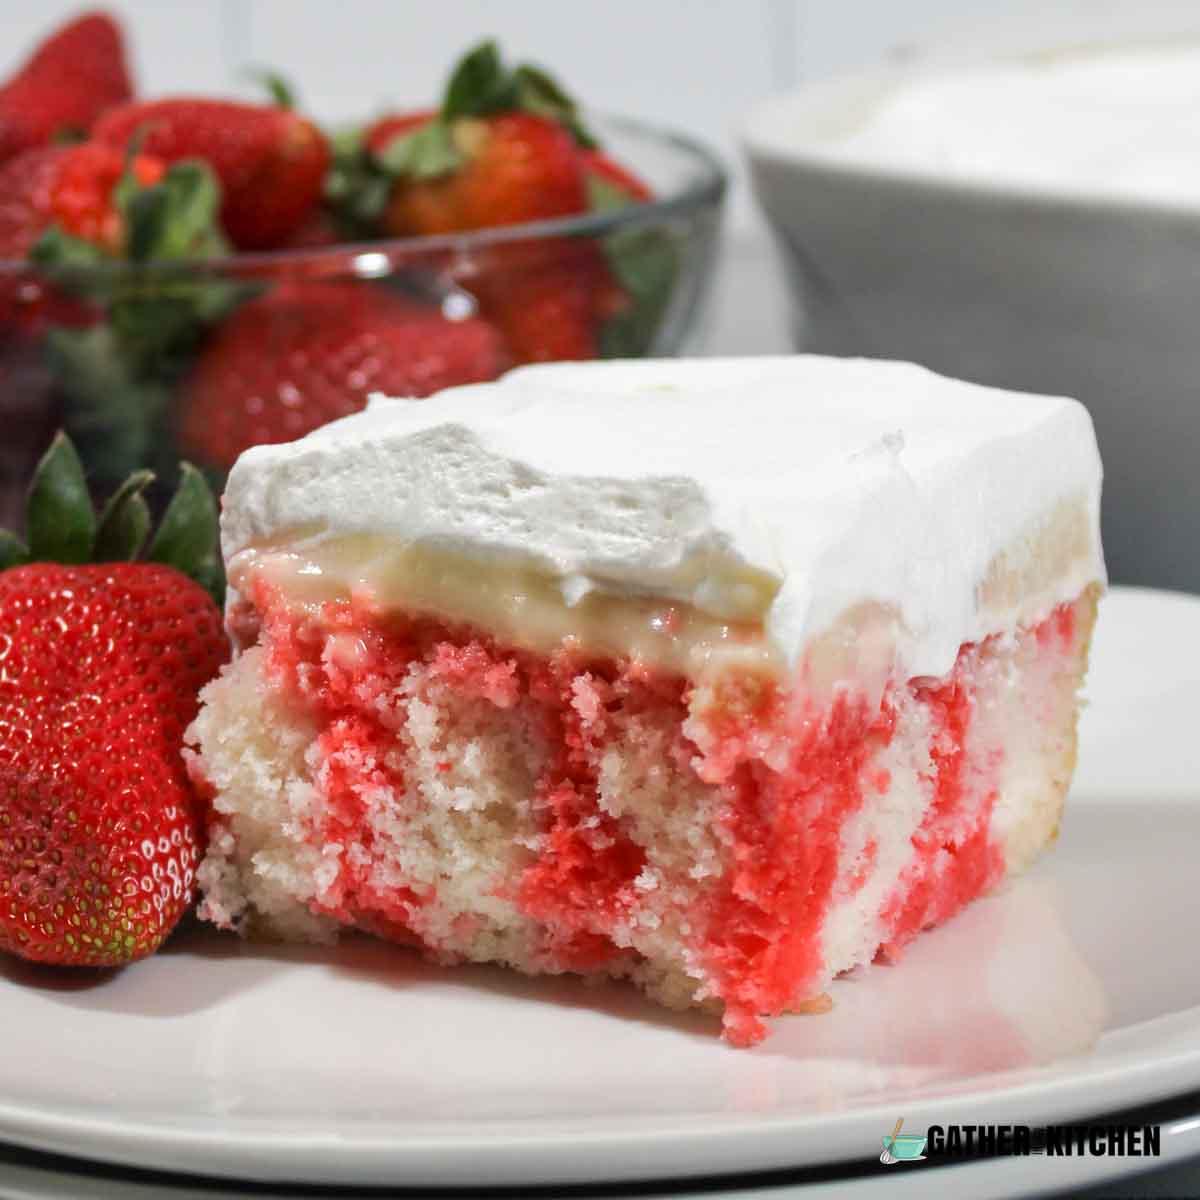 Closeup of a piece of Strawberry Jello Poke Cake on a plate.